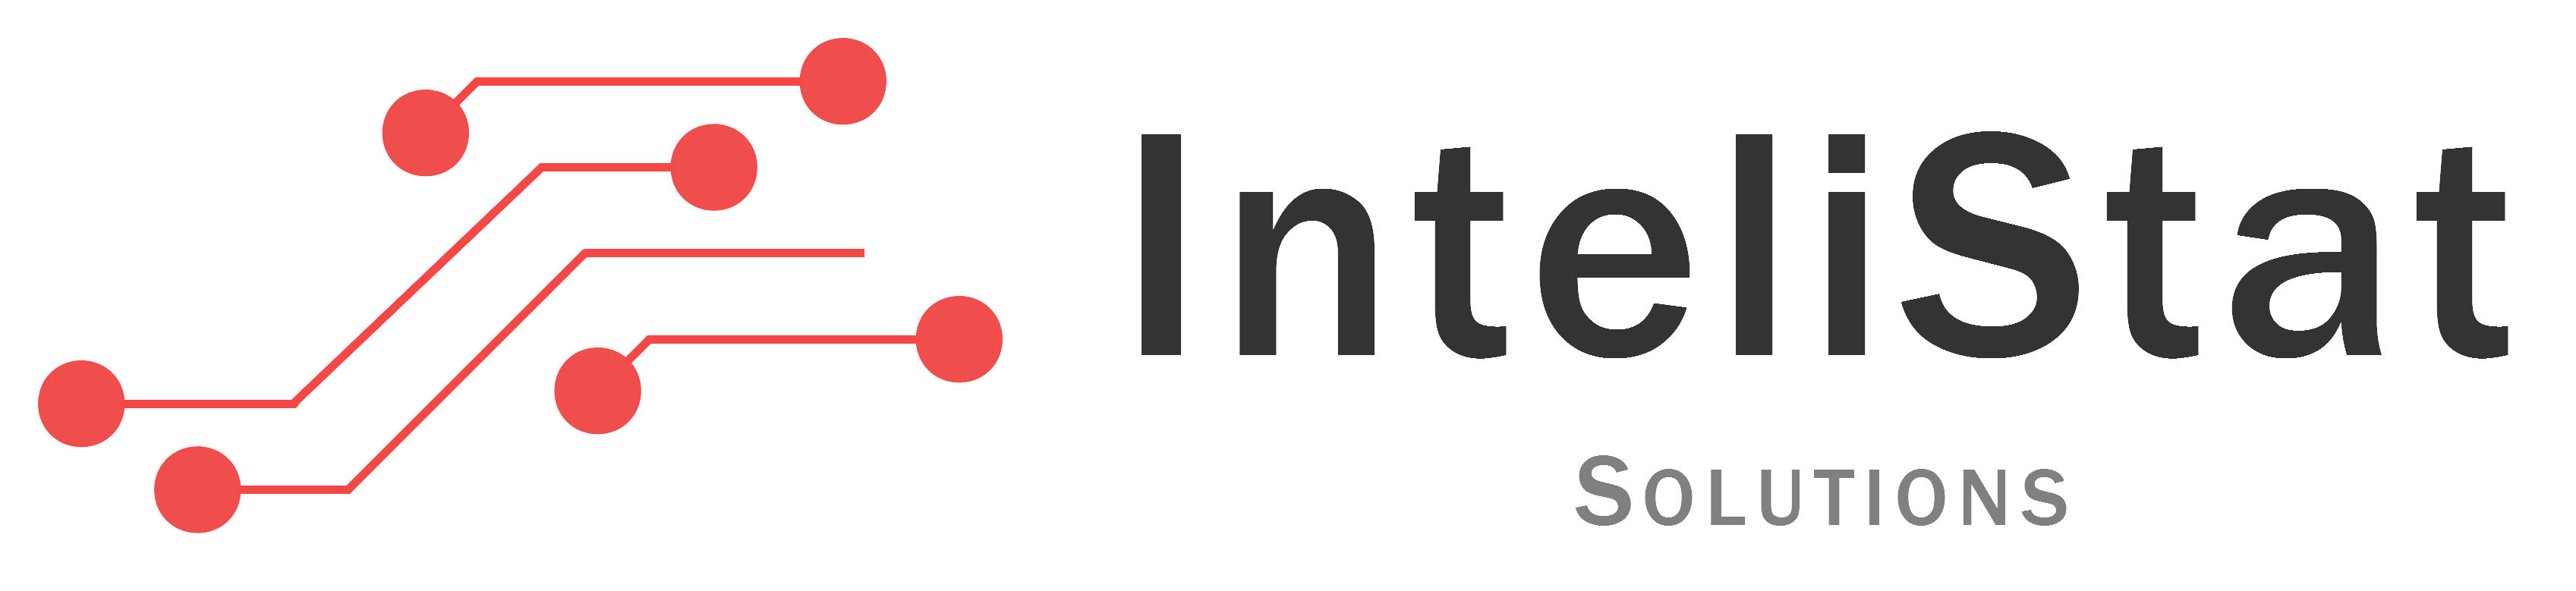 InteliStat Solutions